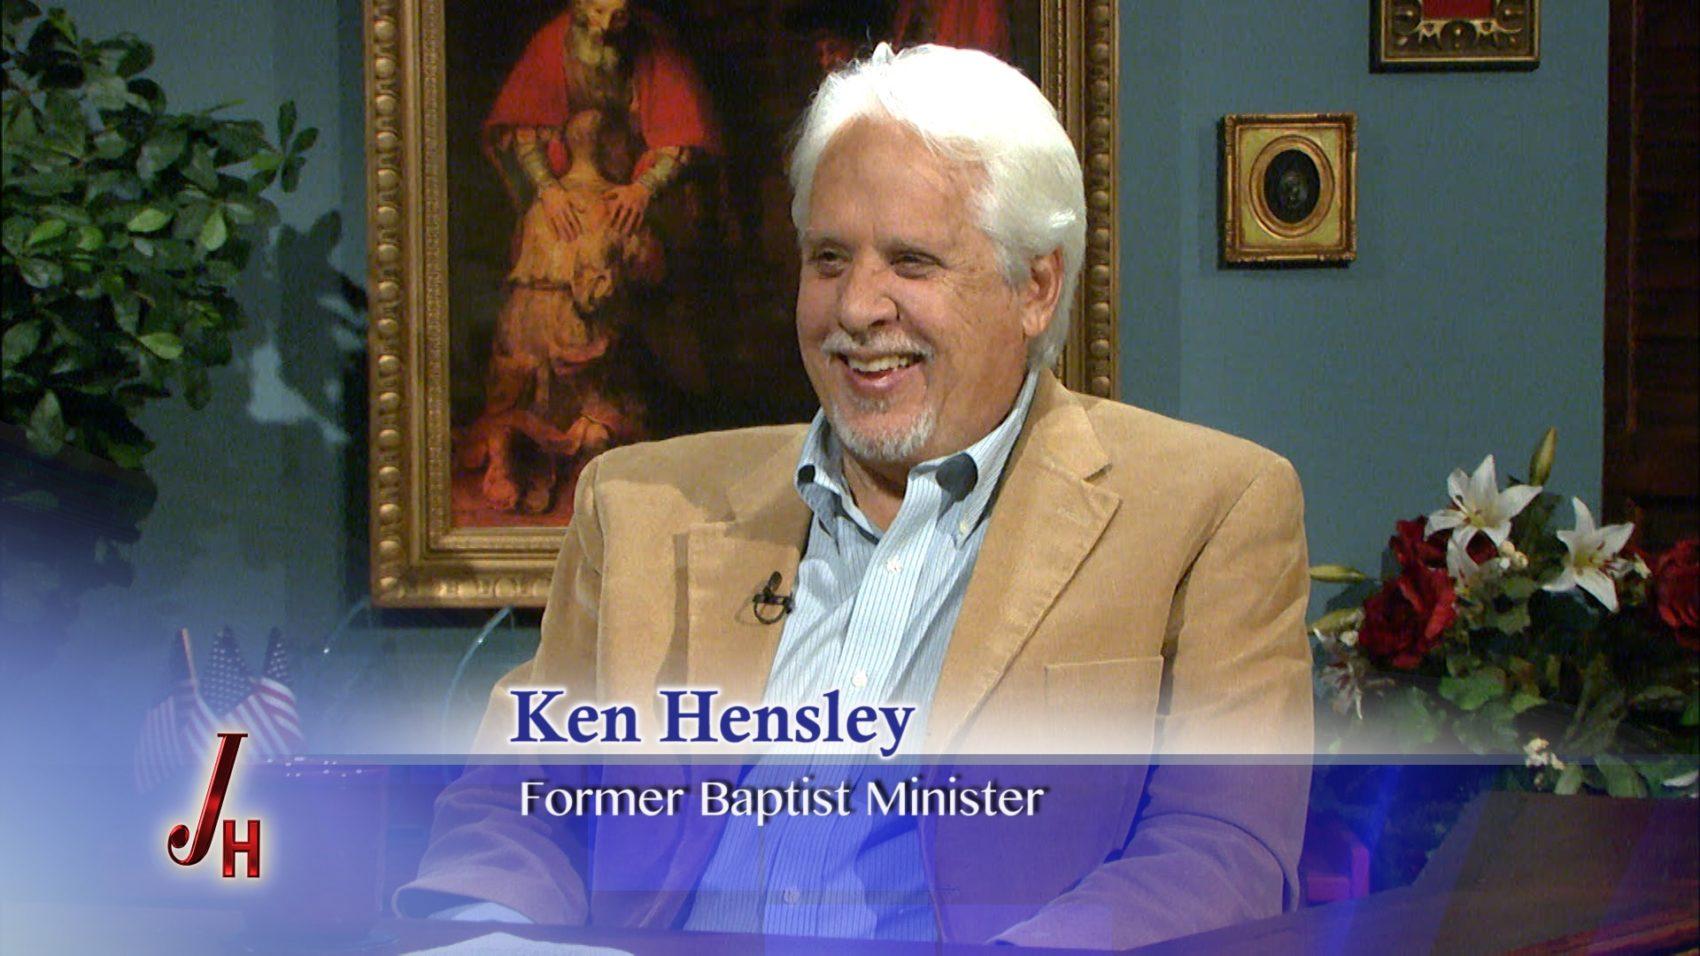 Ken Hensley Former Baptist Pastor The Coming Home Network